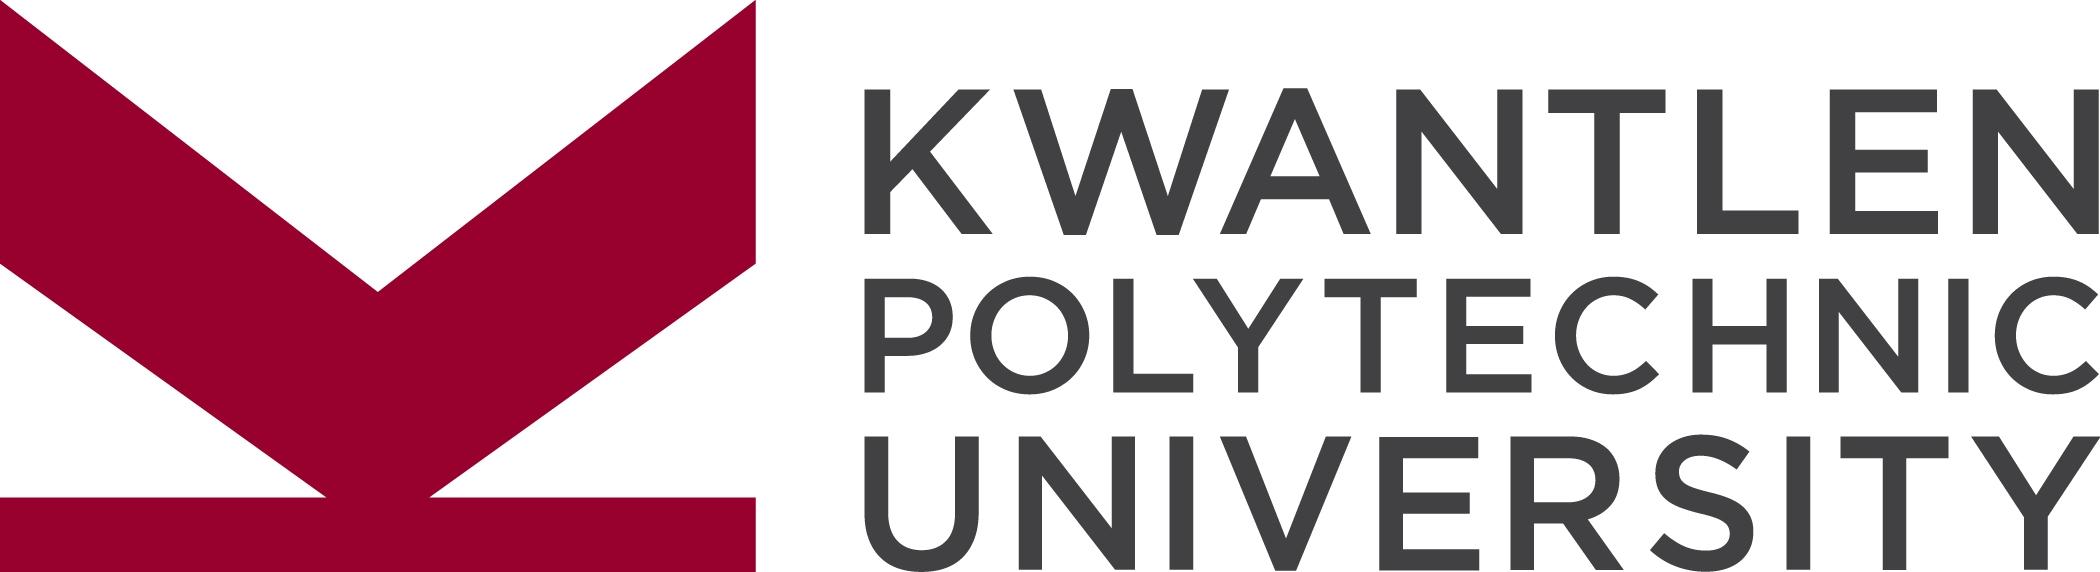 Kwantlen Polytechnic University Icon